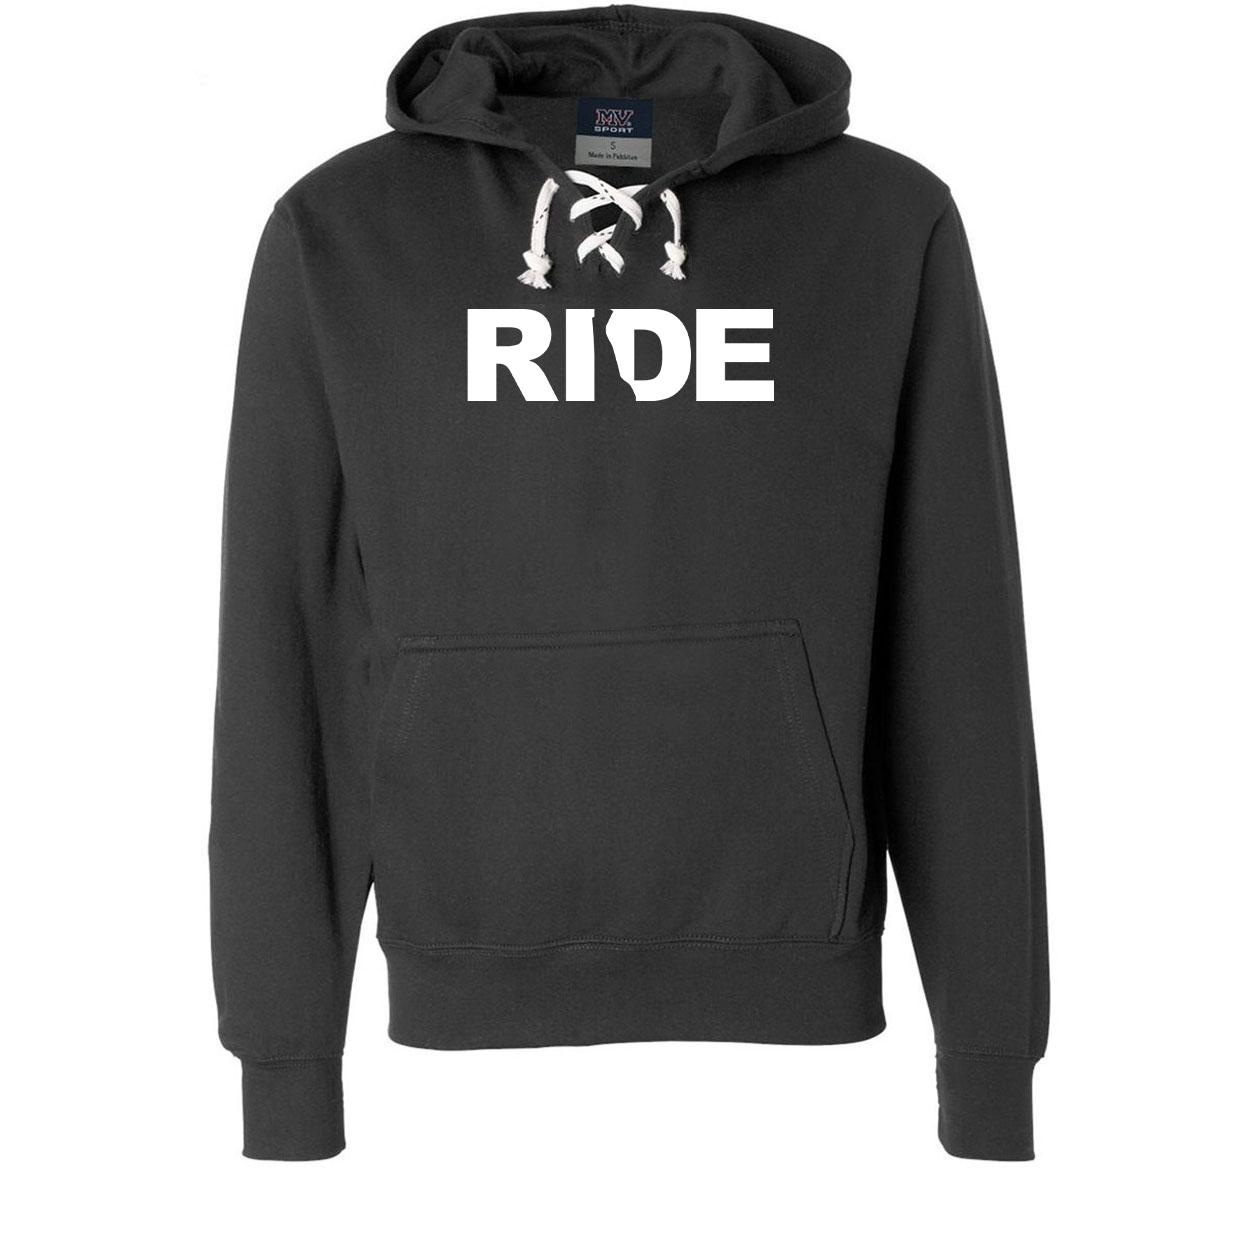 Ride Delaware Classic Unisex Premium Hockey Sweatshirt Black (White Logo)